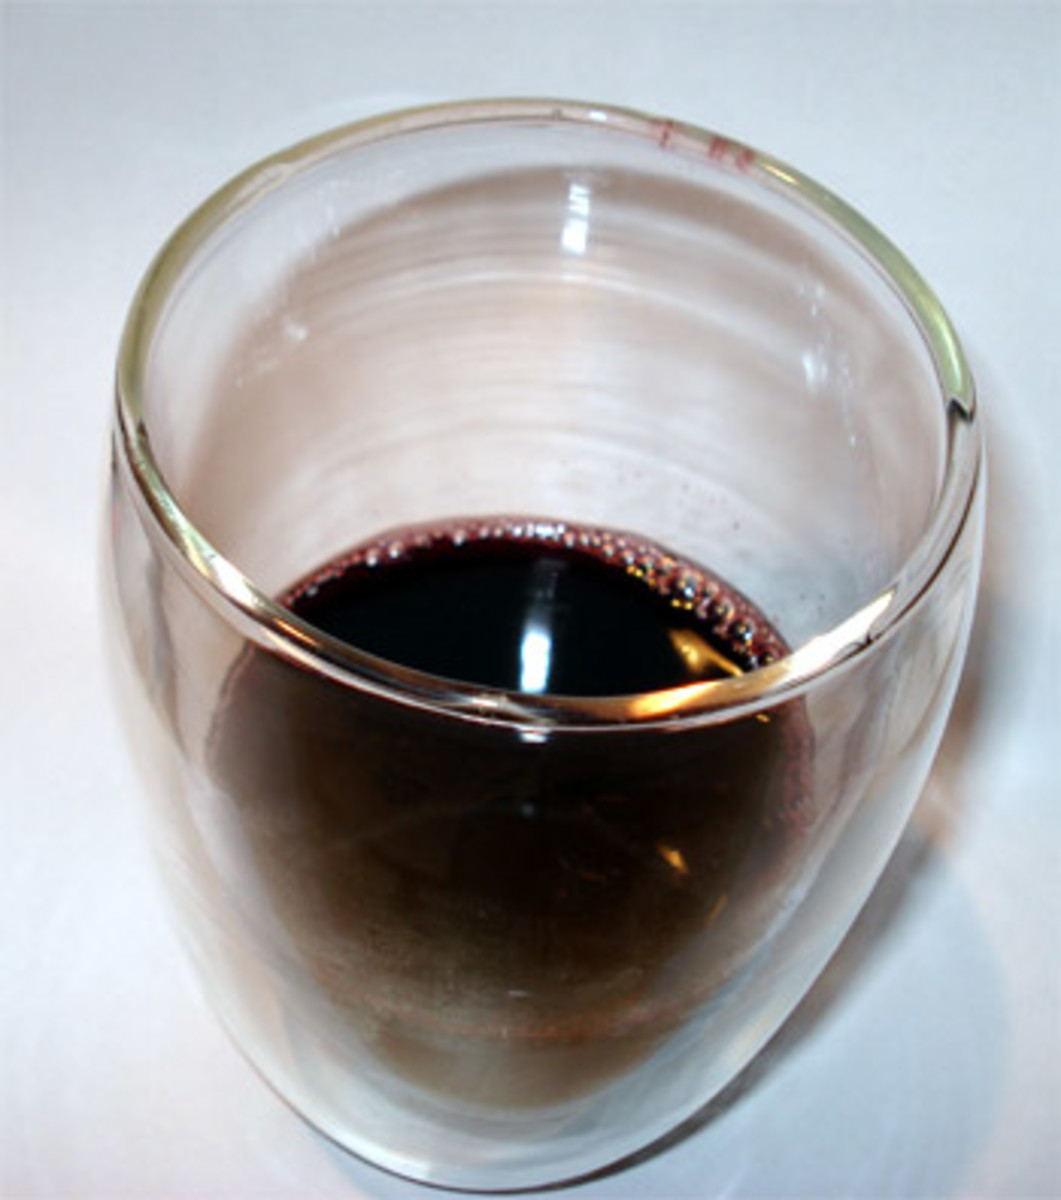 Aronia berry juice - notice the dark purple color